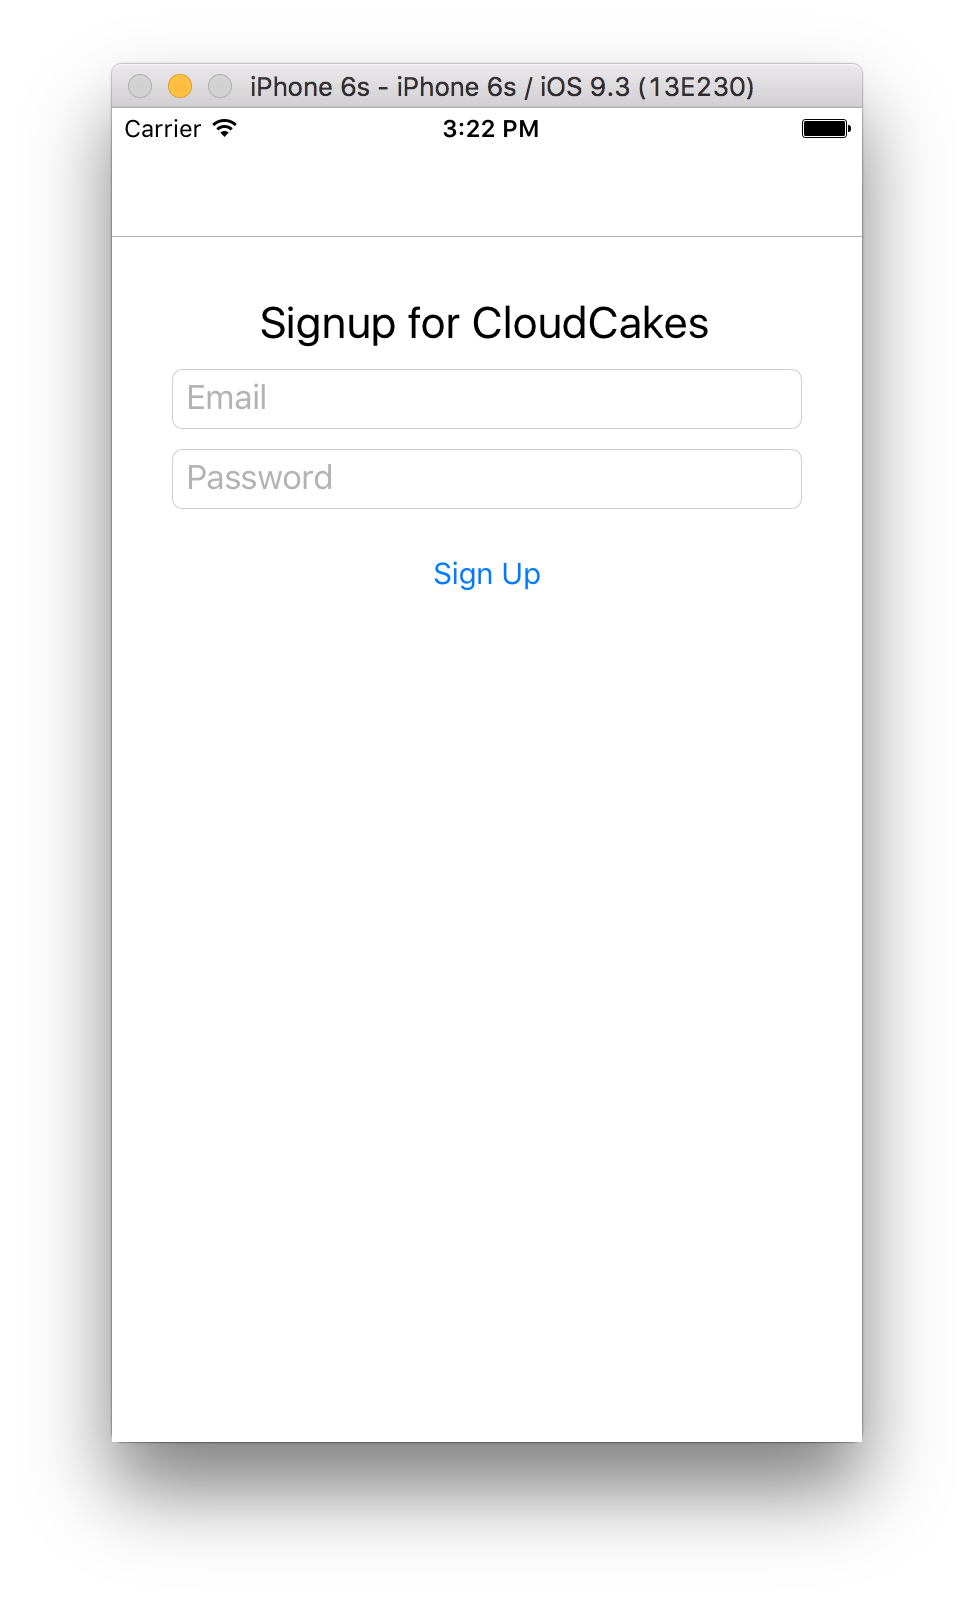 CloudCakes Signup Page